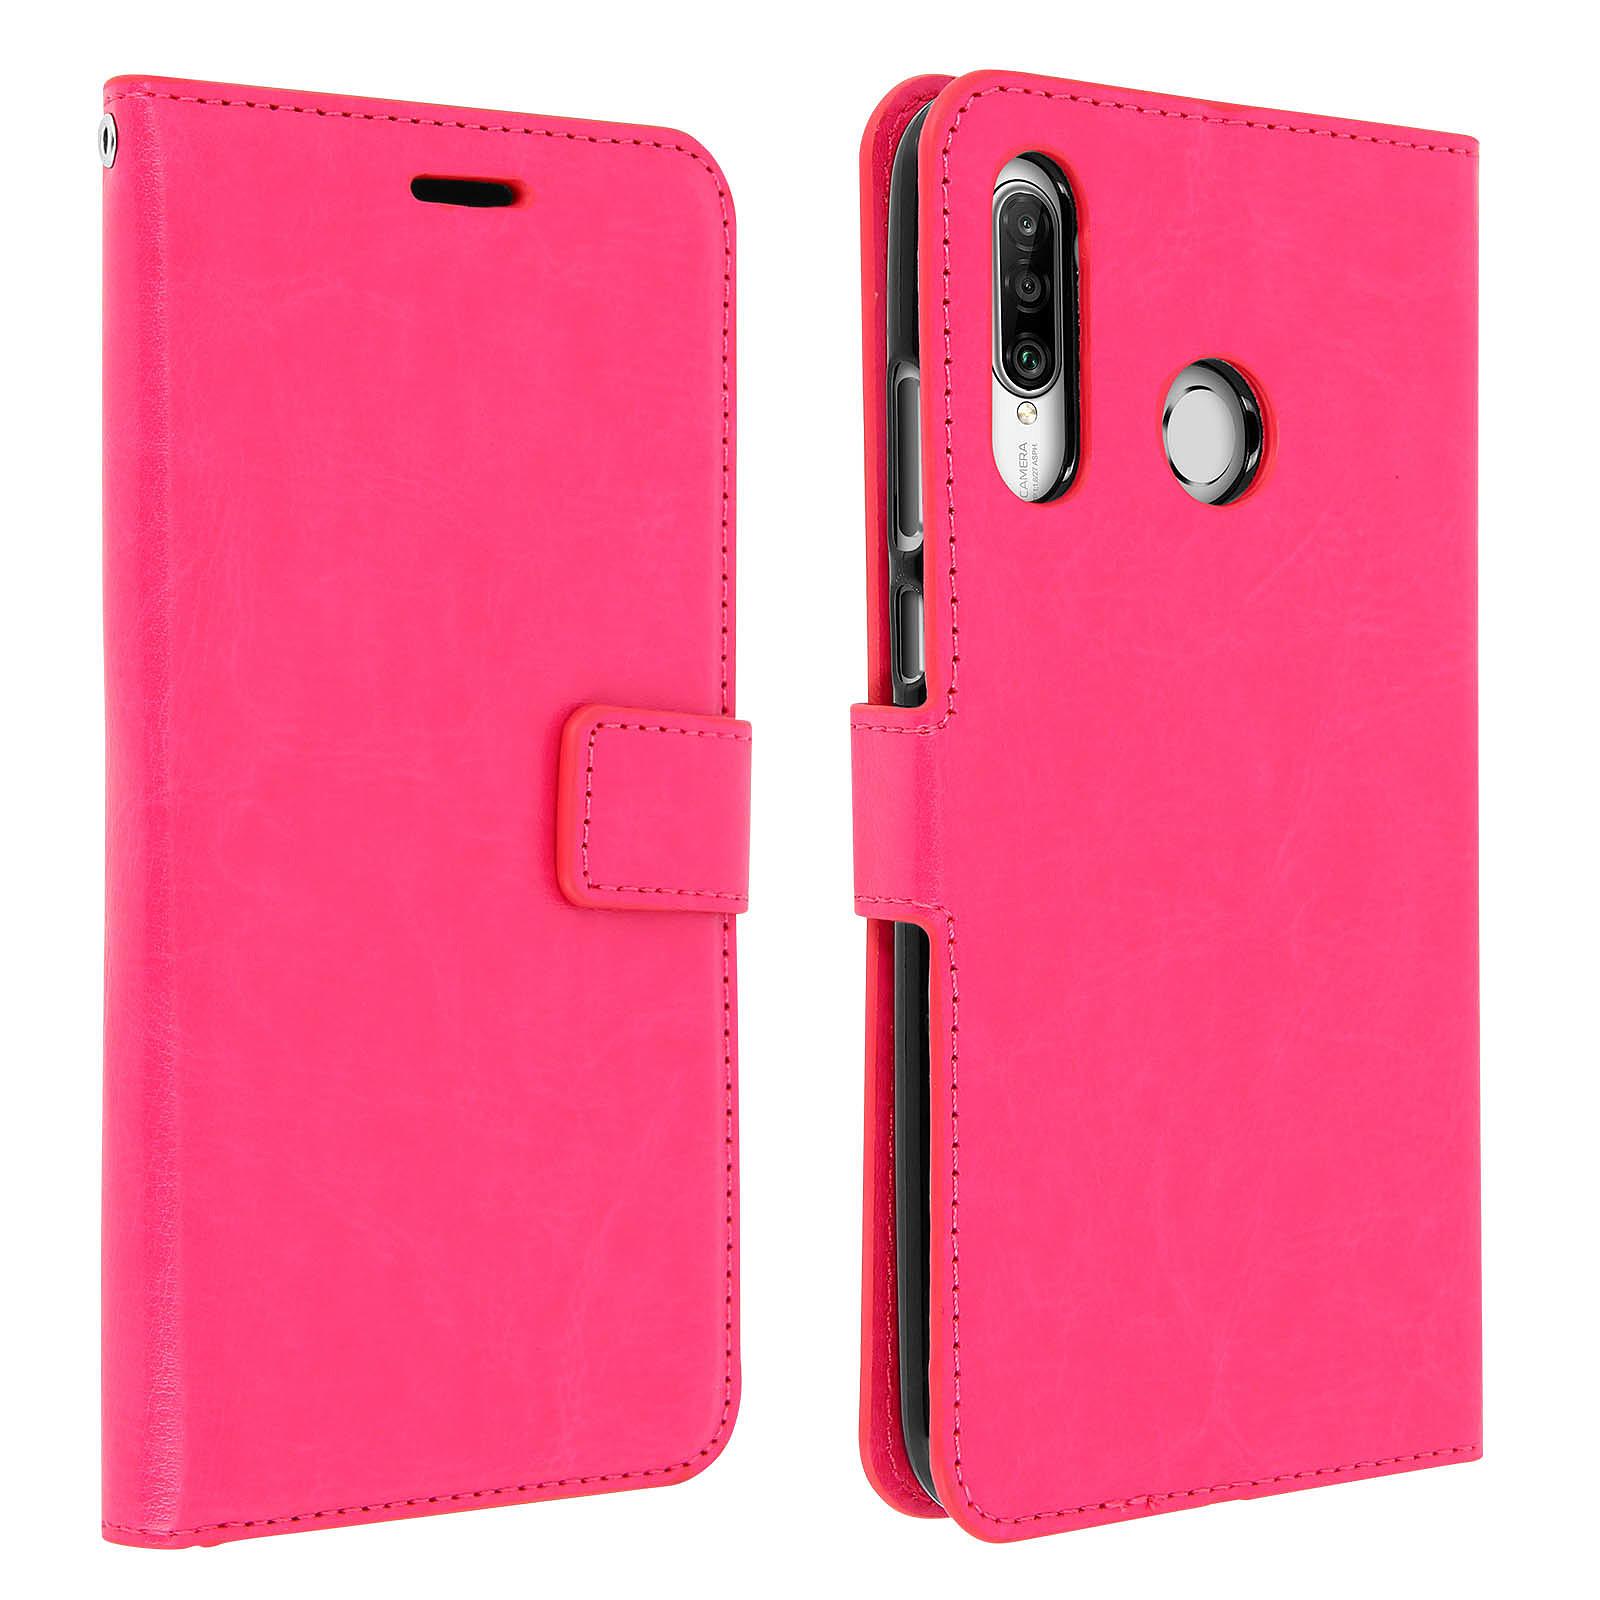 Avizar Etui folio Rose pour Huawei P30 Lite , Honor 20S , Huawei P30 Lite XL